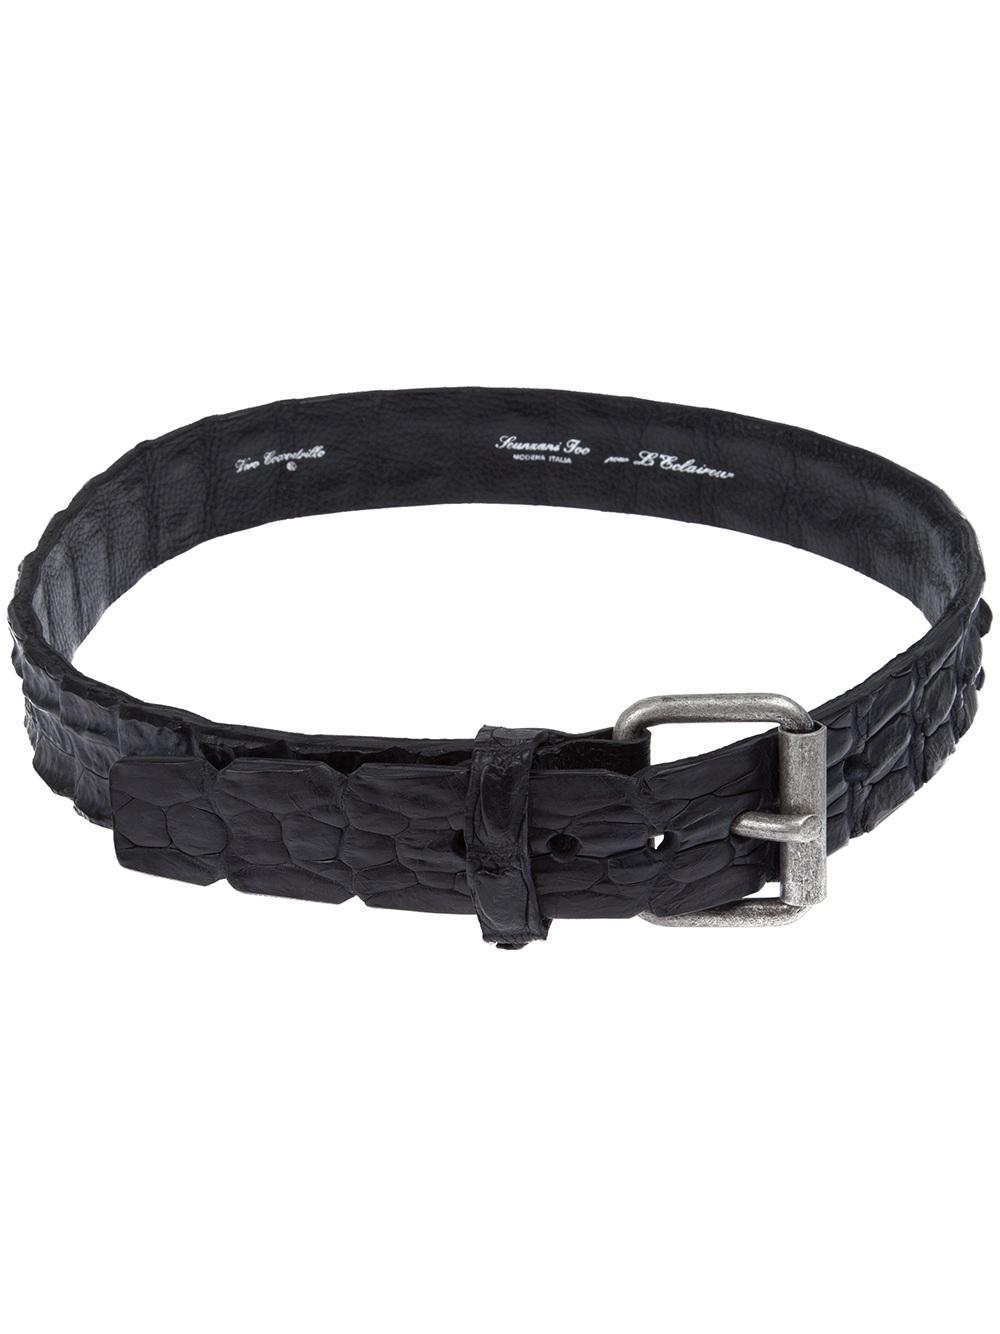 scunzani ivo crocodile leather belt in black lyst